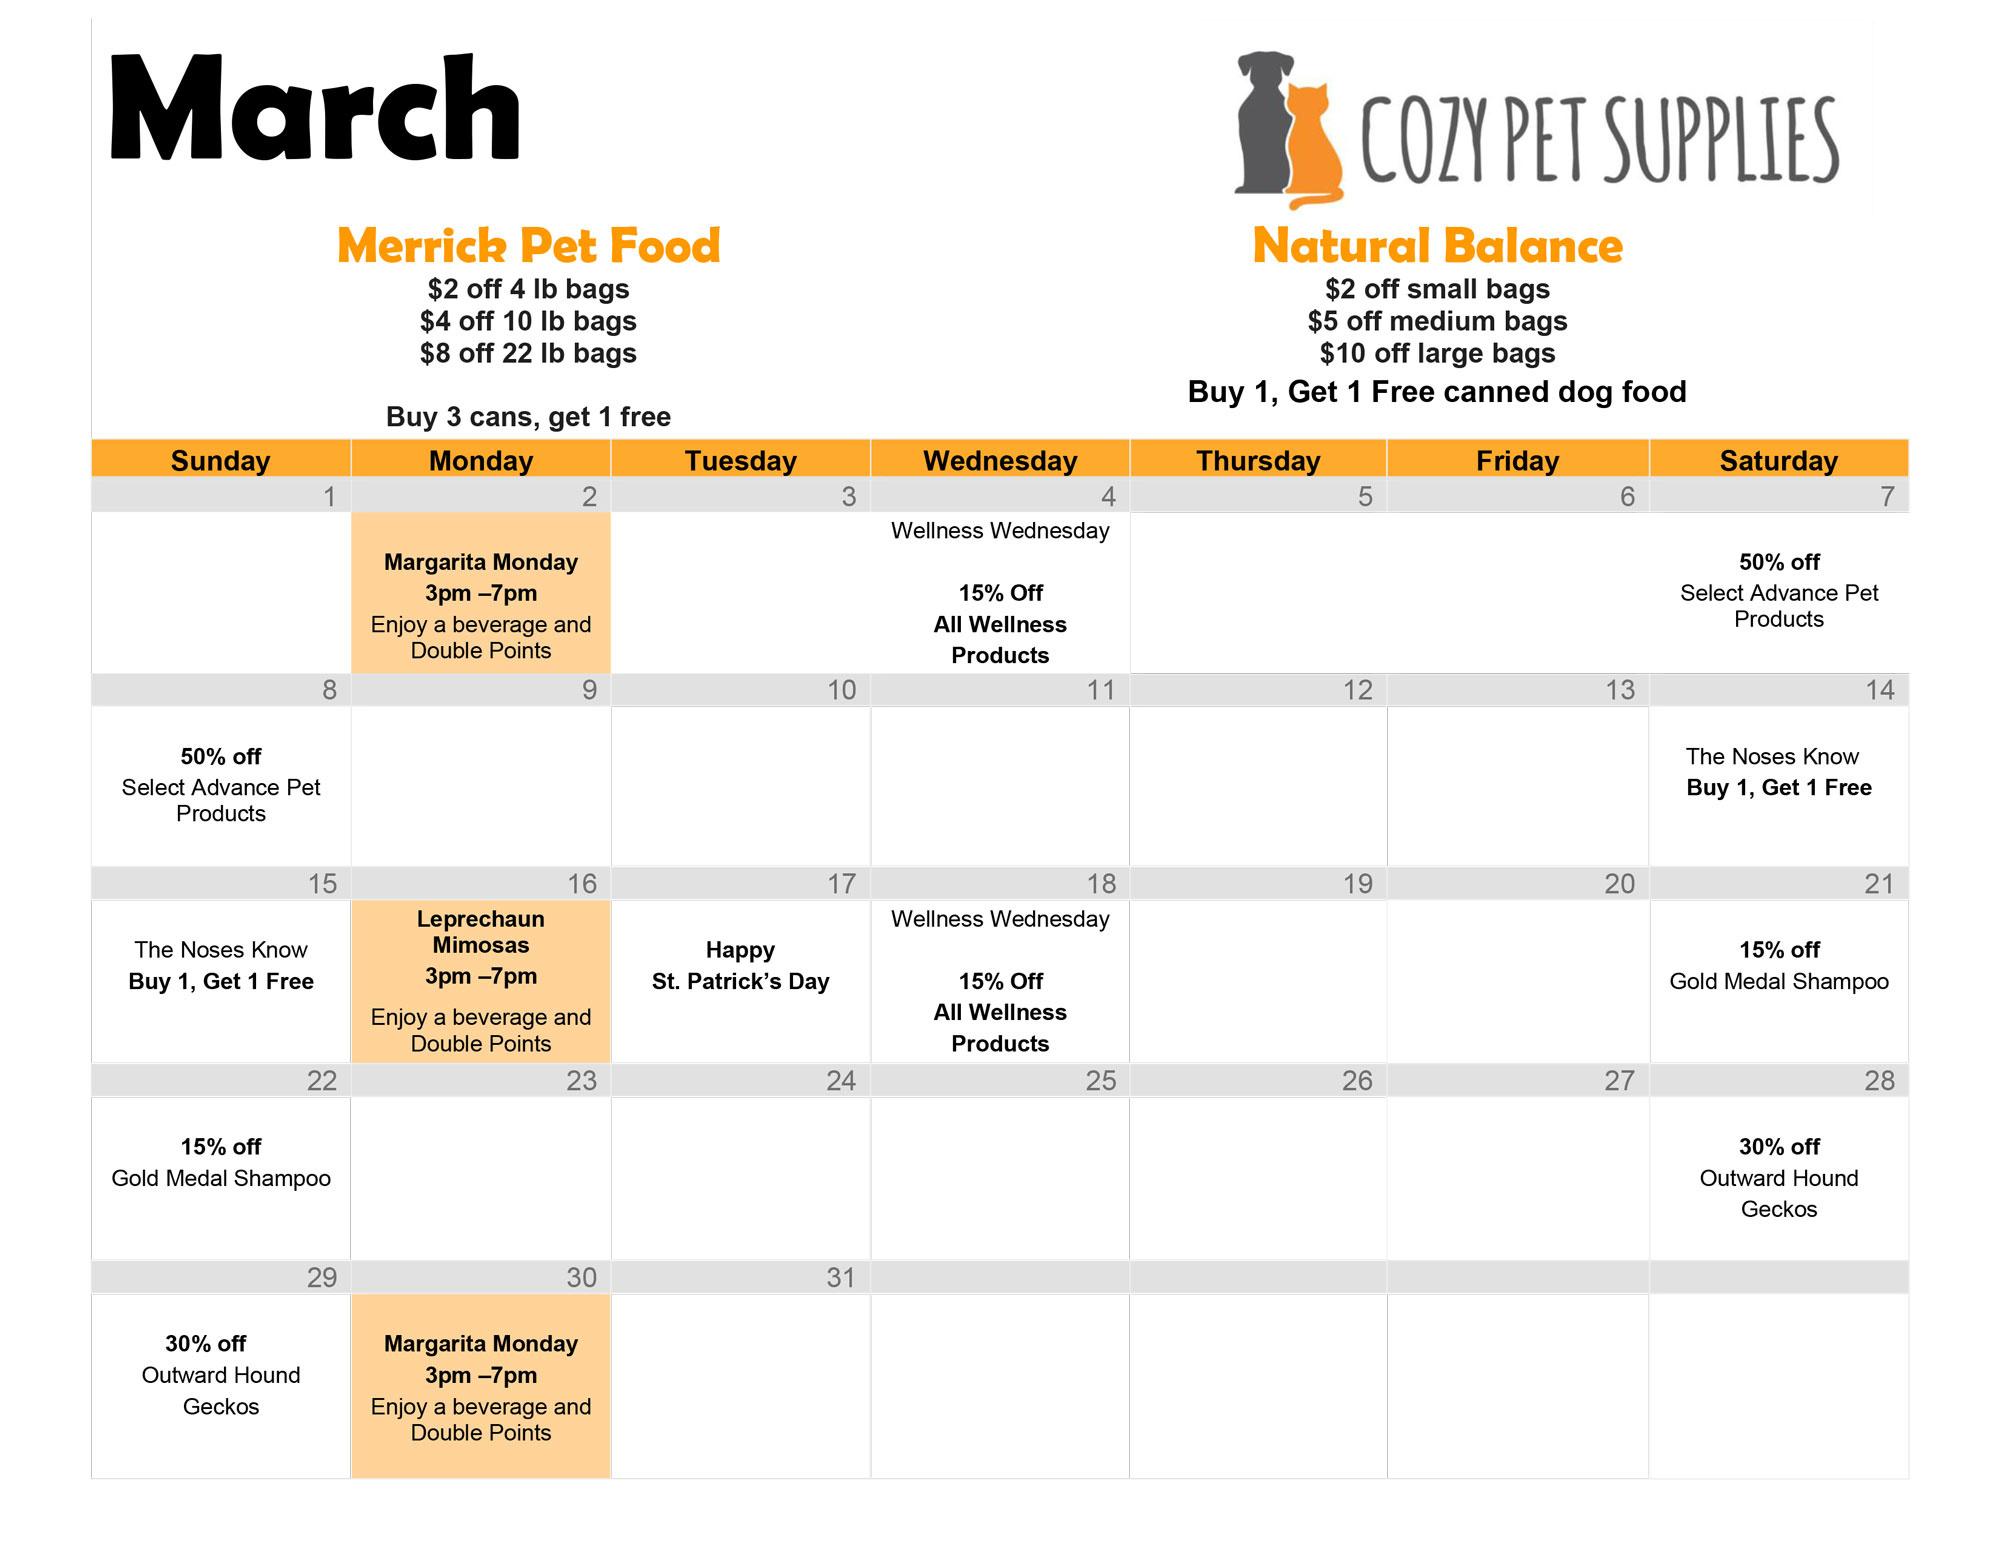 Cozy Pet Supplies March Calendar